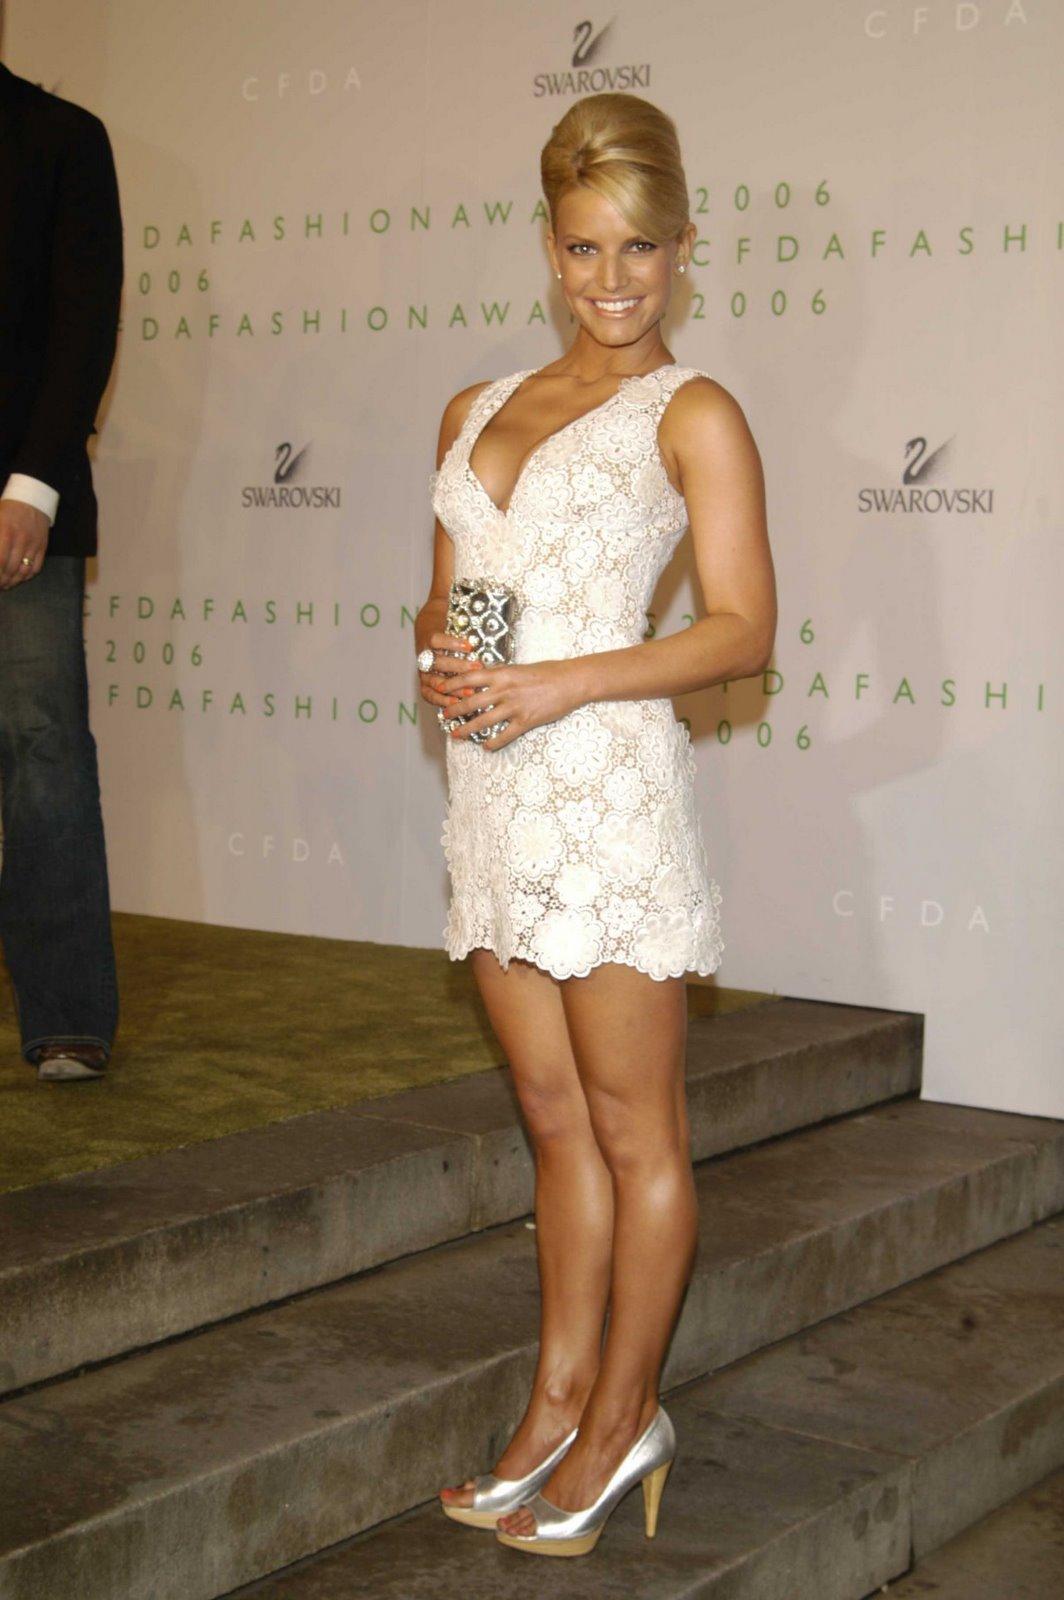 http://4.bp.blogspot.com/_jVFYJ4sAkJw/TOQWYaVKdaI/AAAAAAAAALA/7RE734JN9Ow/s1600/jessica-simpson-dress.jpg